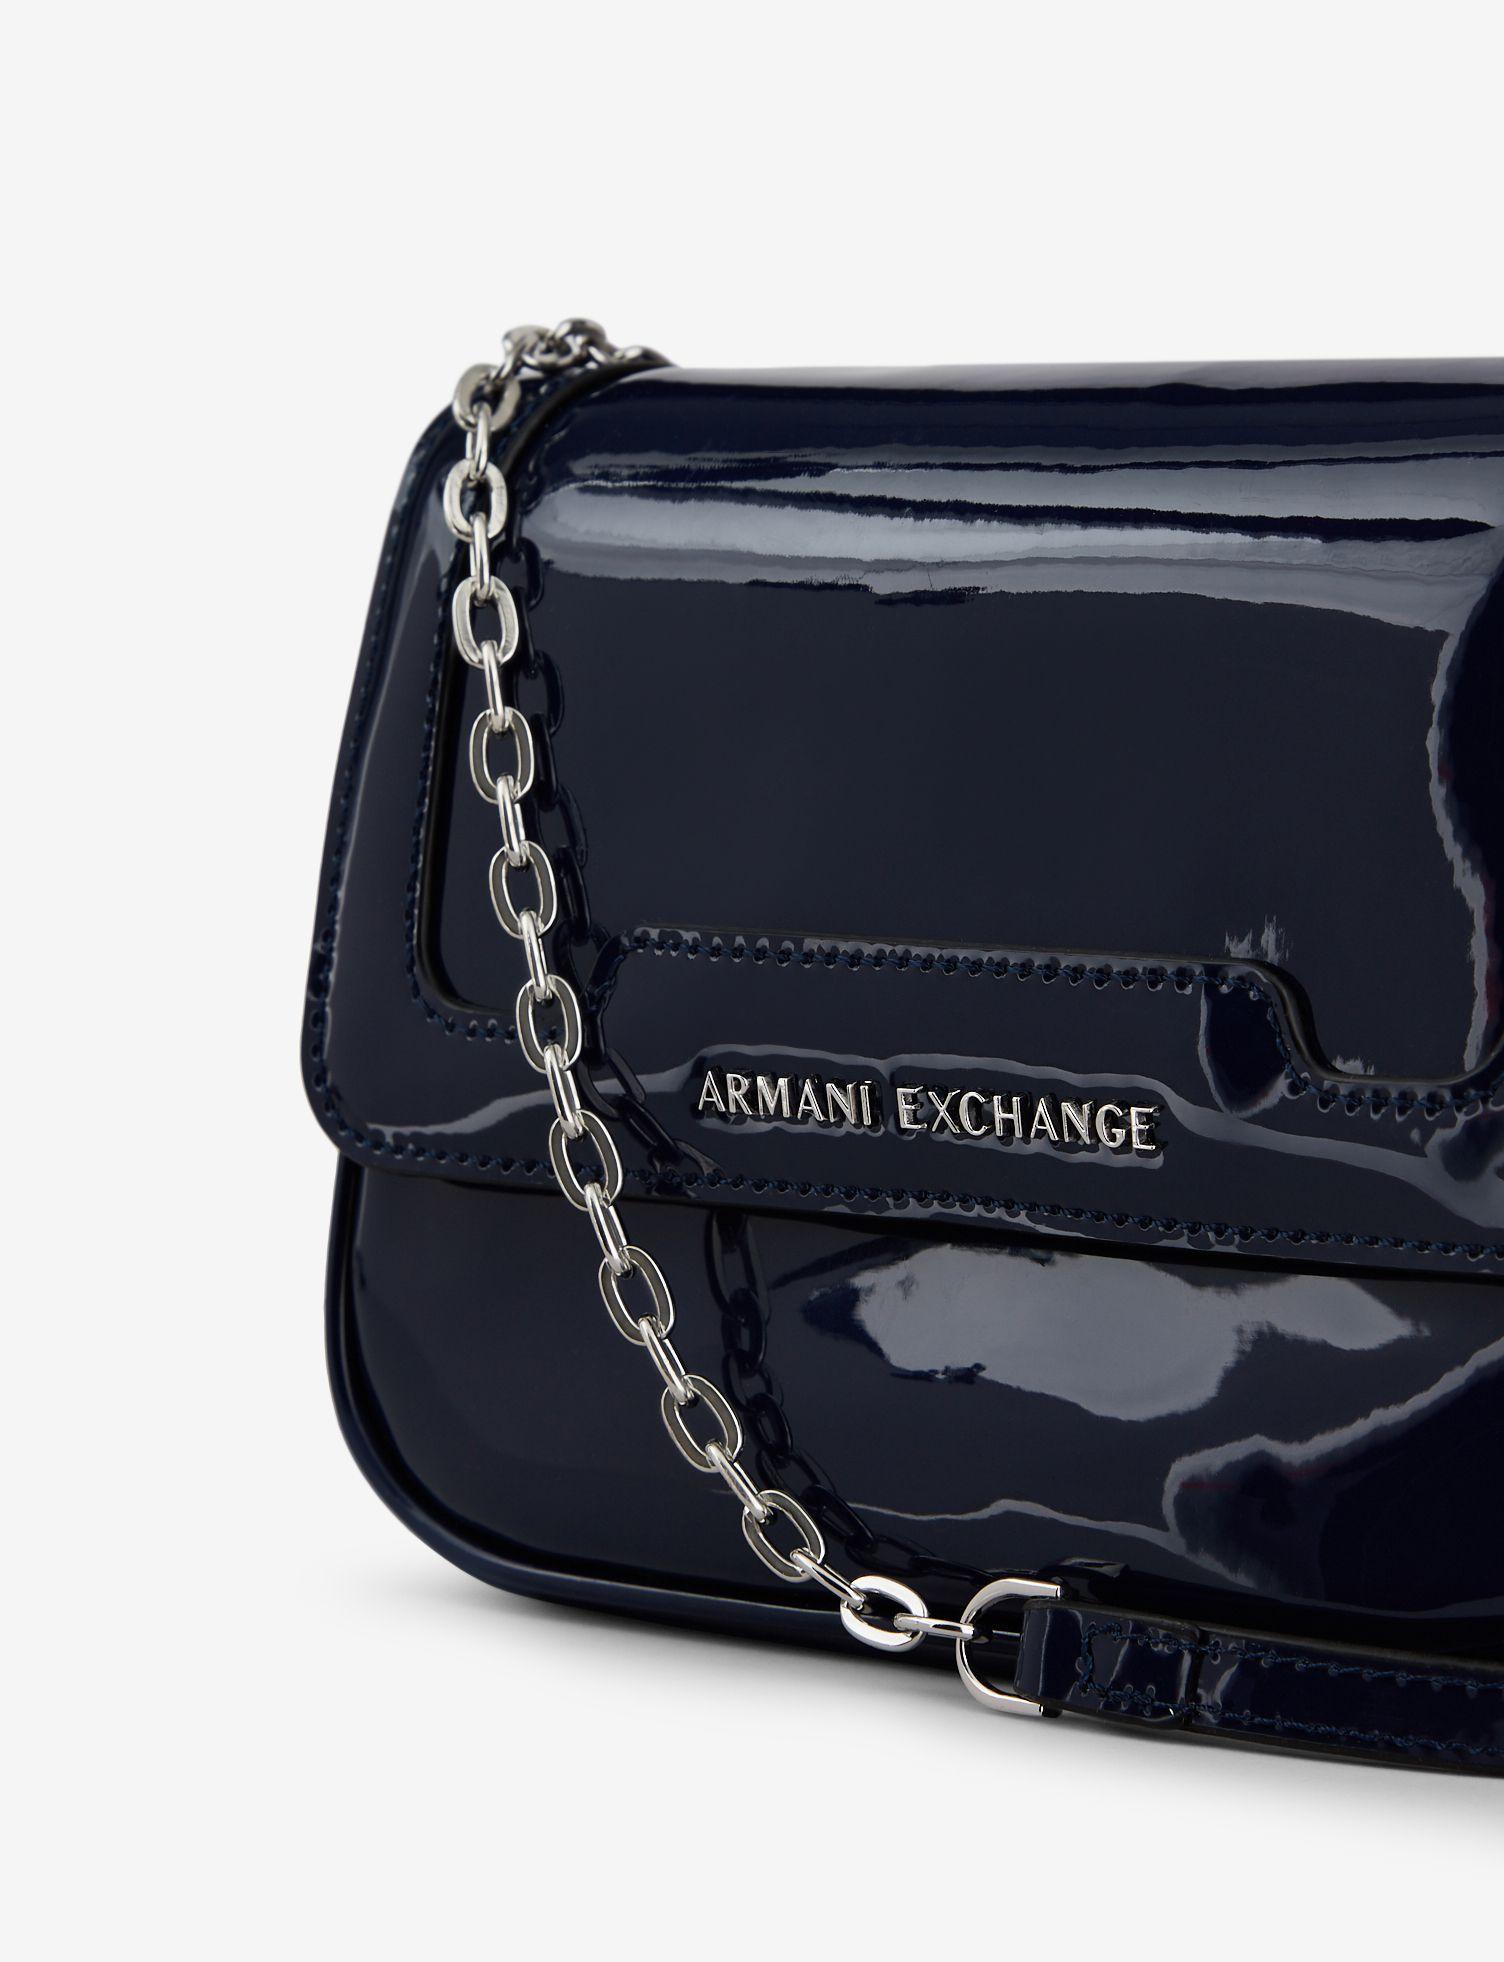 9d1b9d06288 Armani Exchange - Blue Bag With Chain Strap - Lyst. View fullscreen